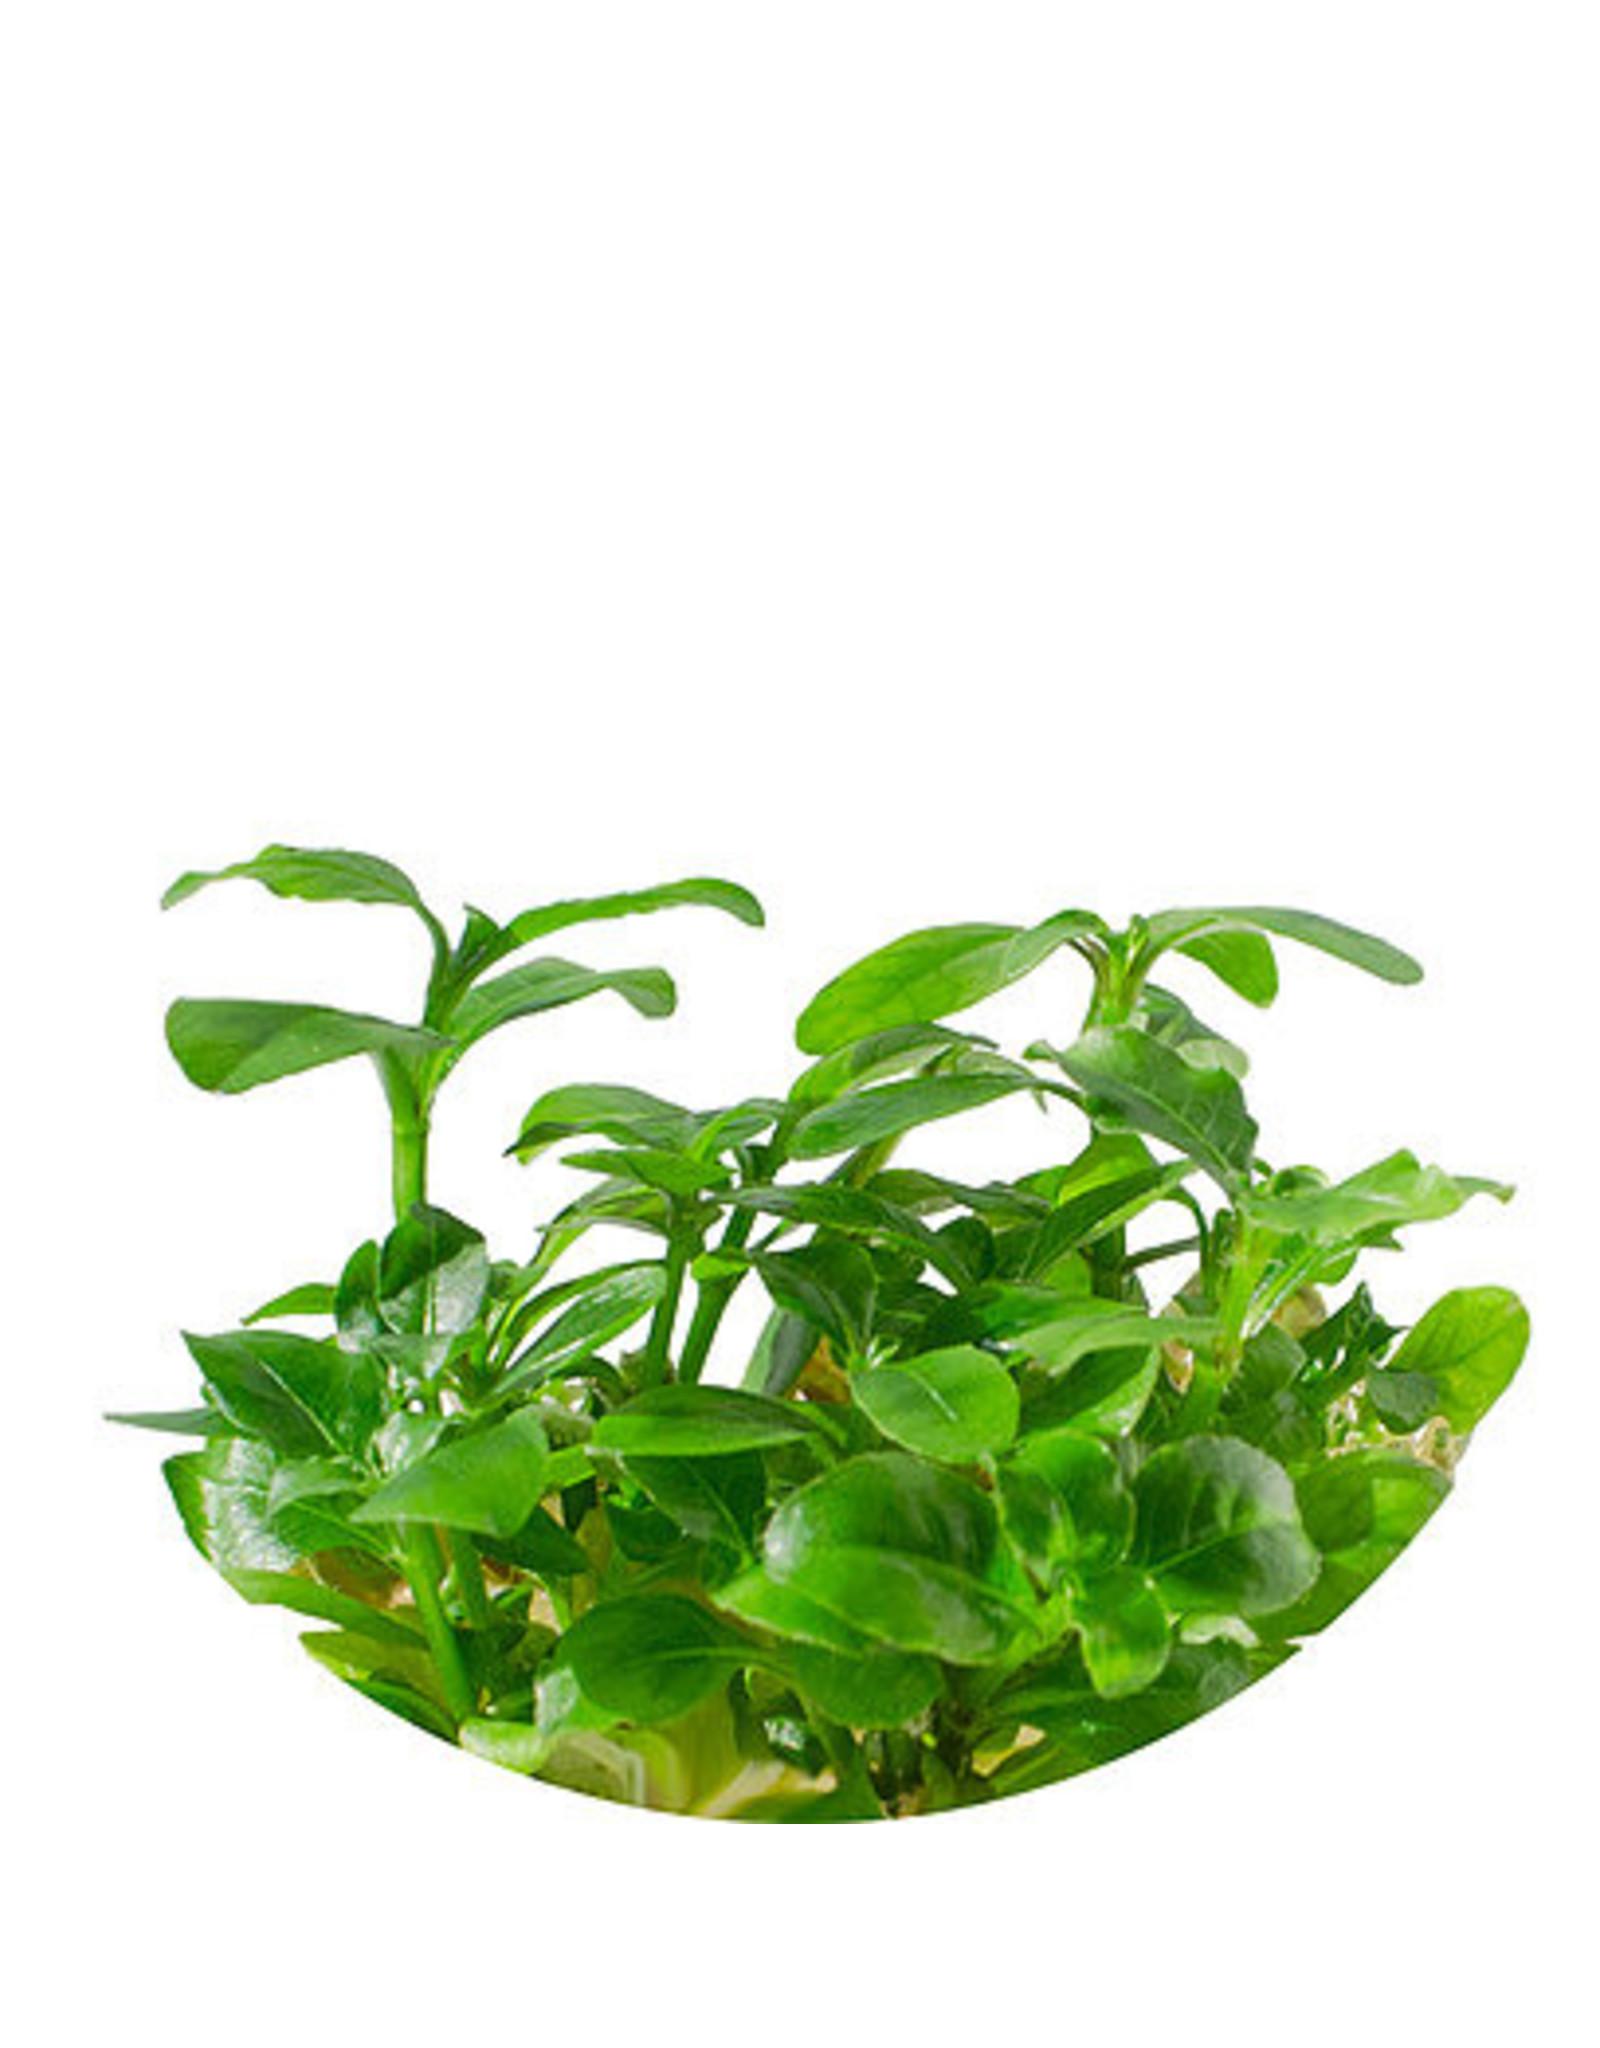 ABC Plants ABC PLANTS - Hygrophila polysperma 'rouge'